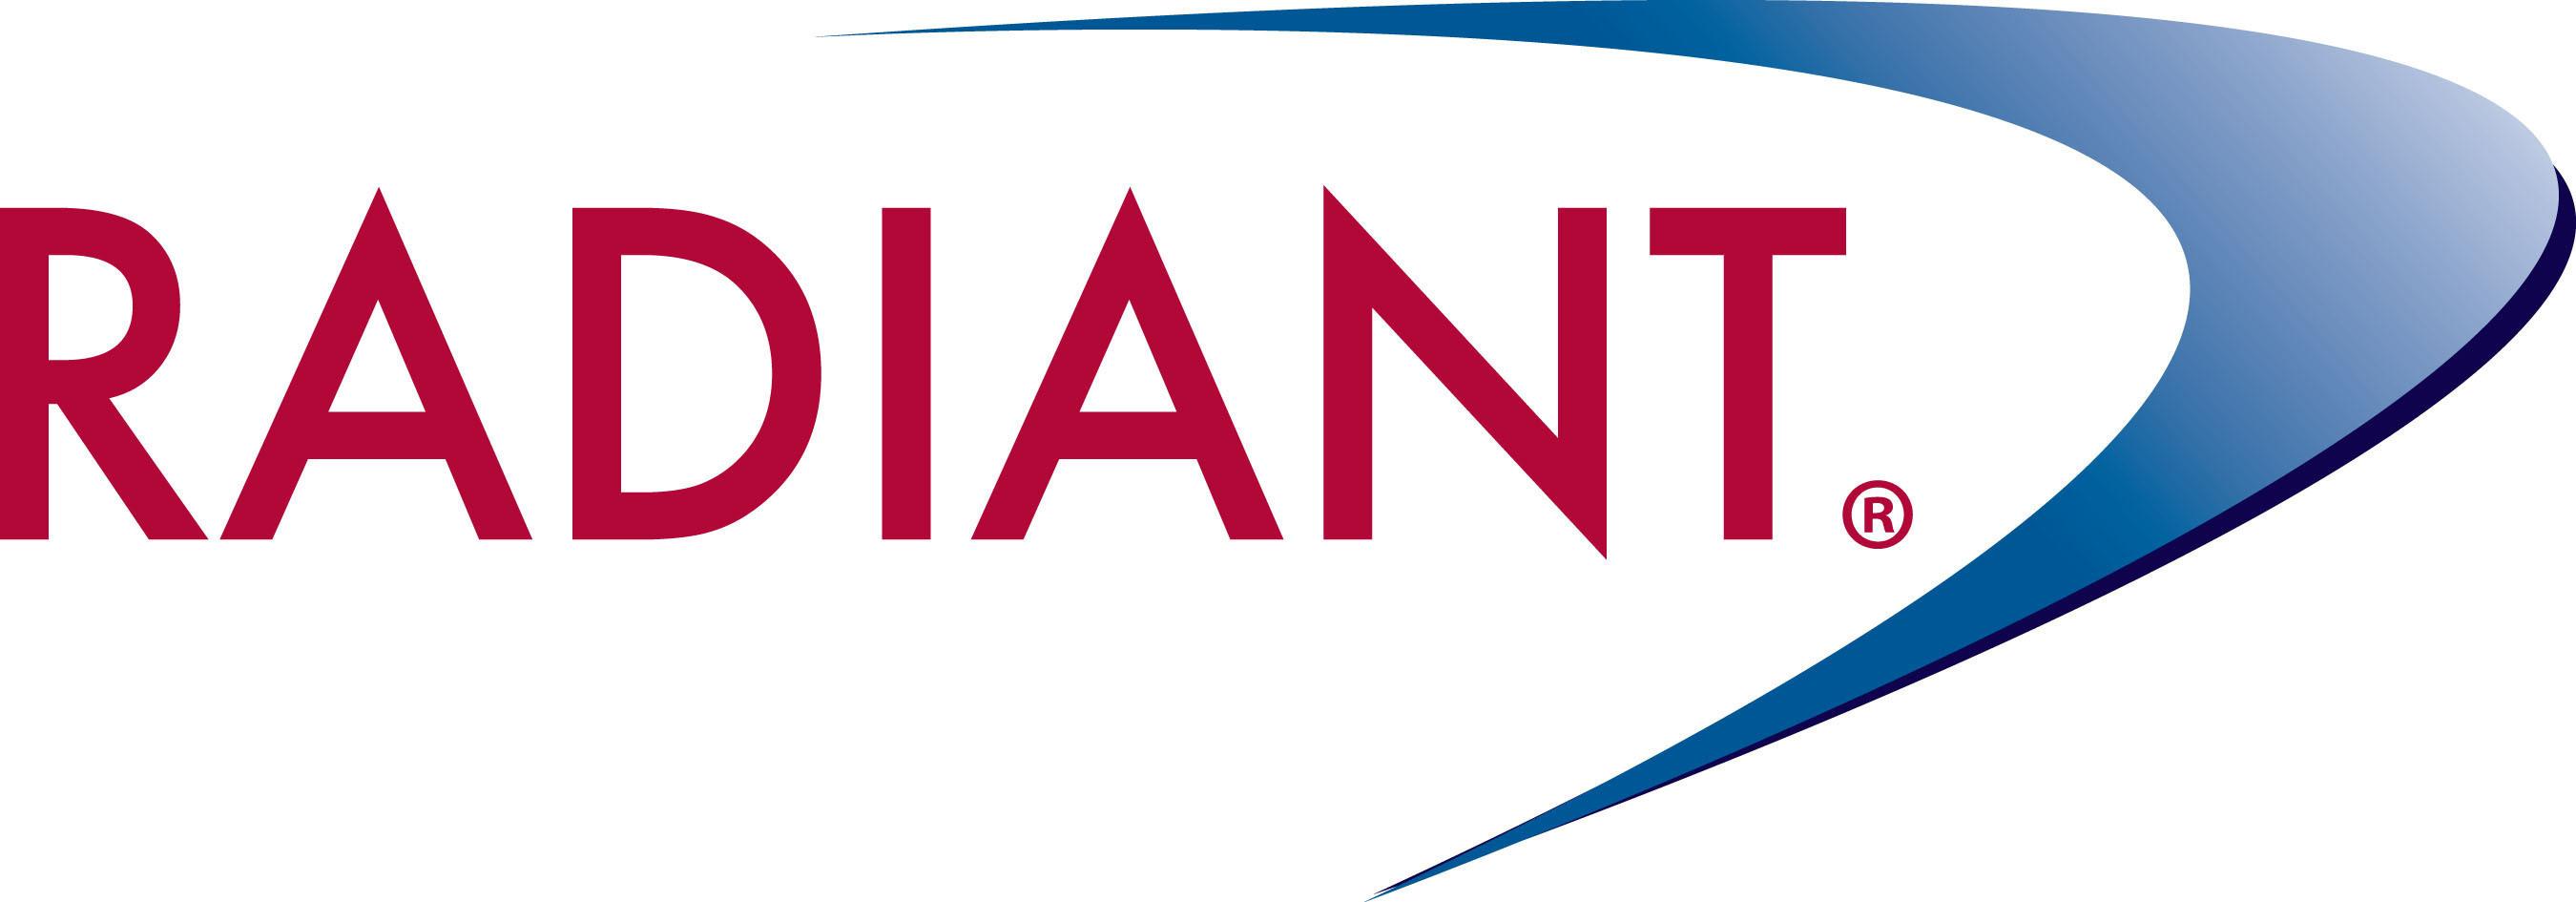 Radiant Logistics, Inc. logo.